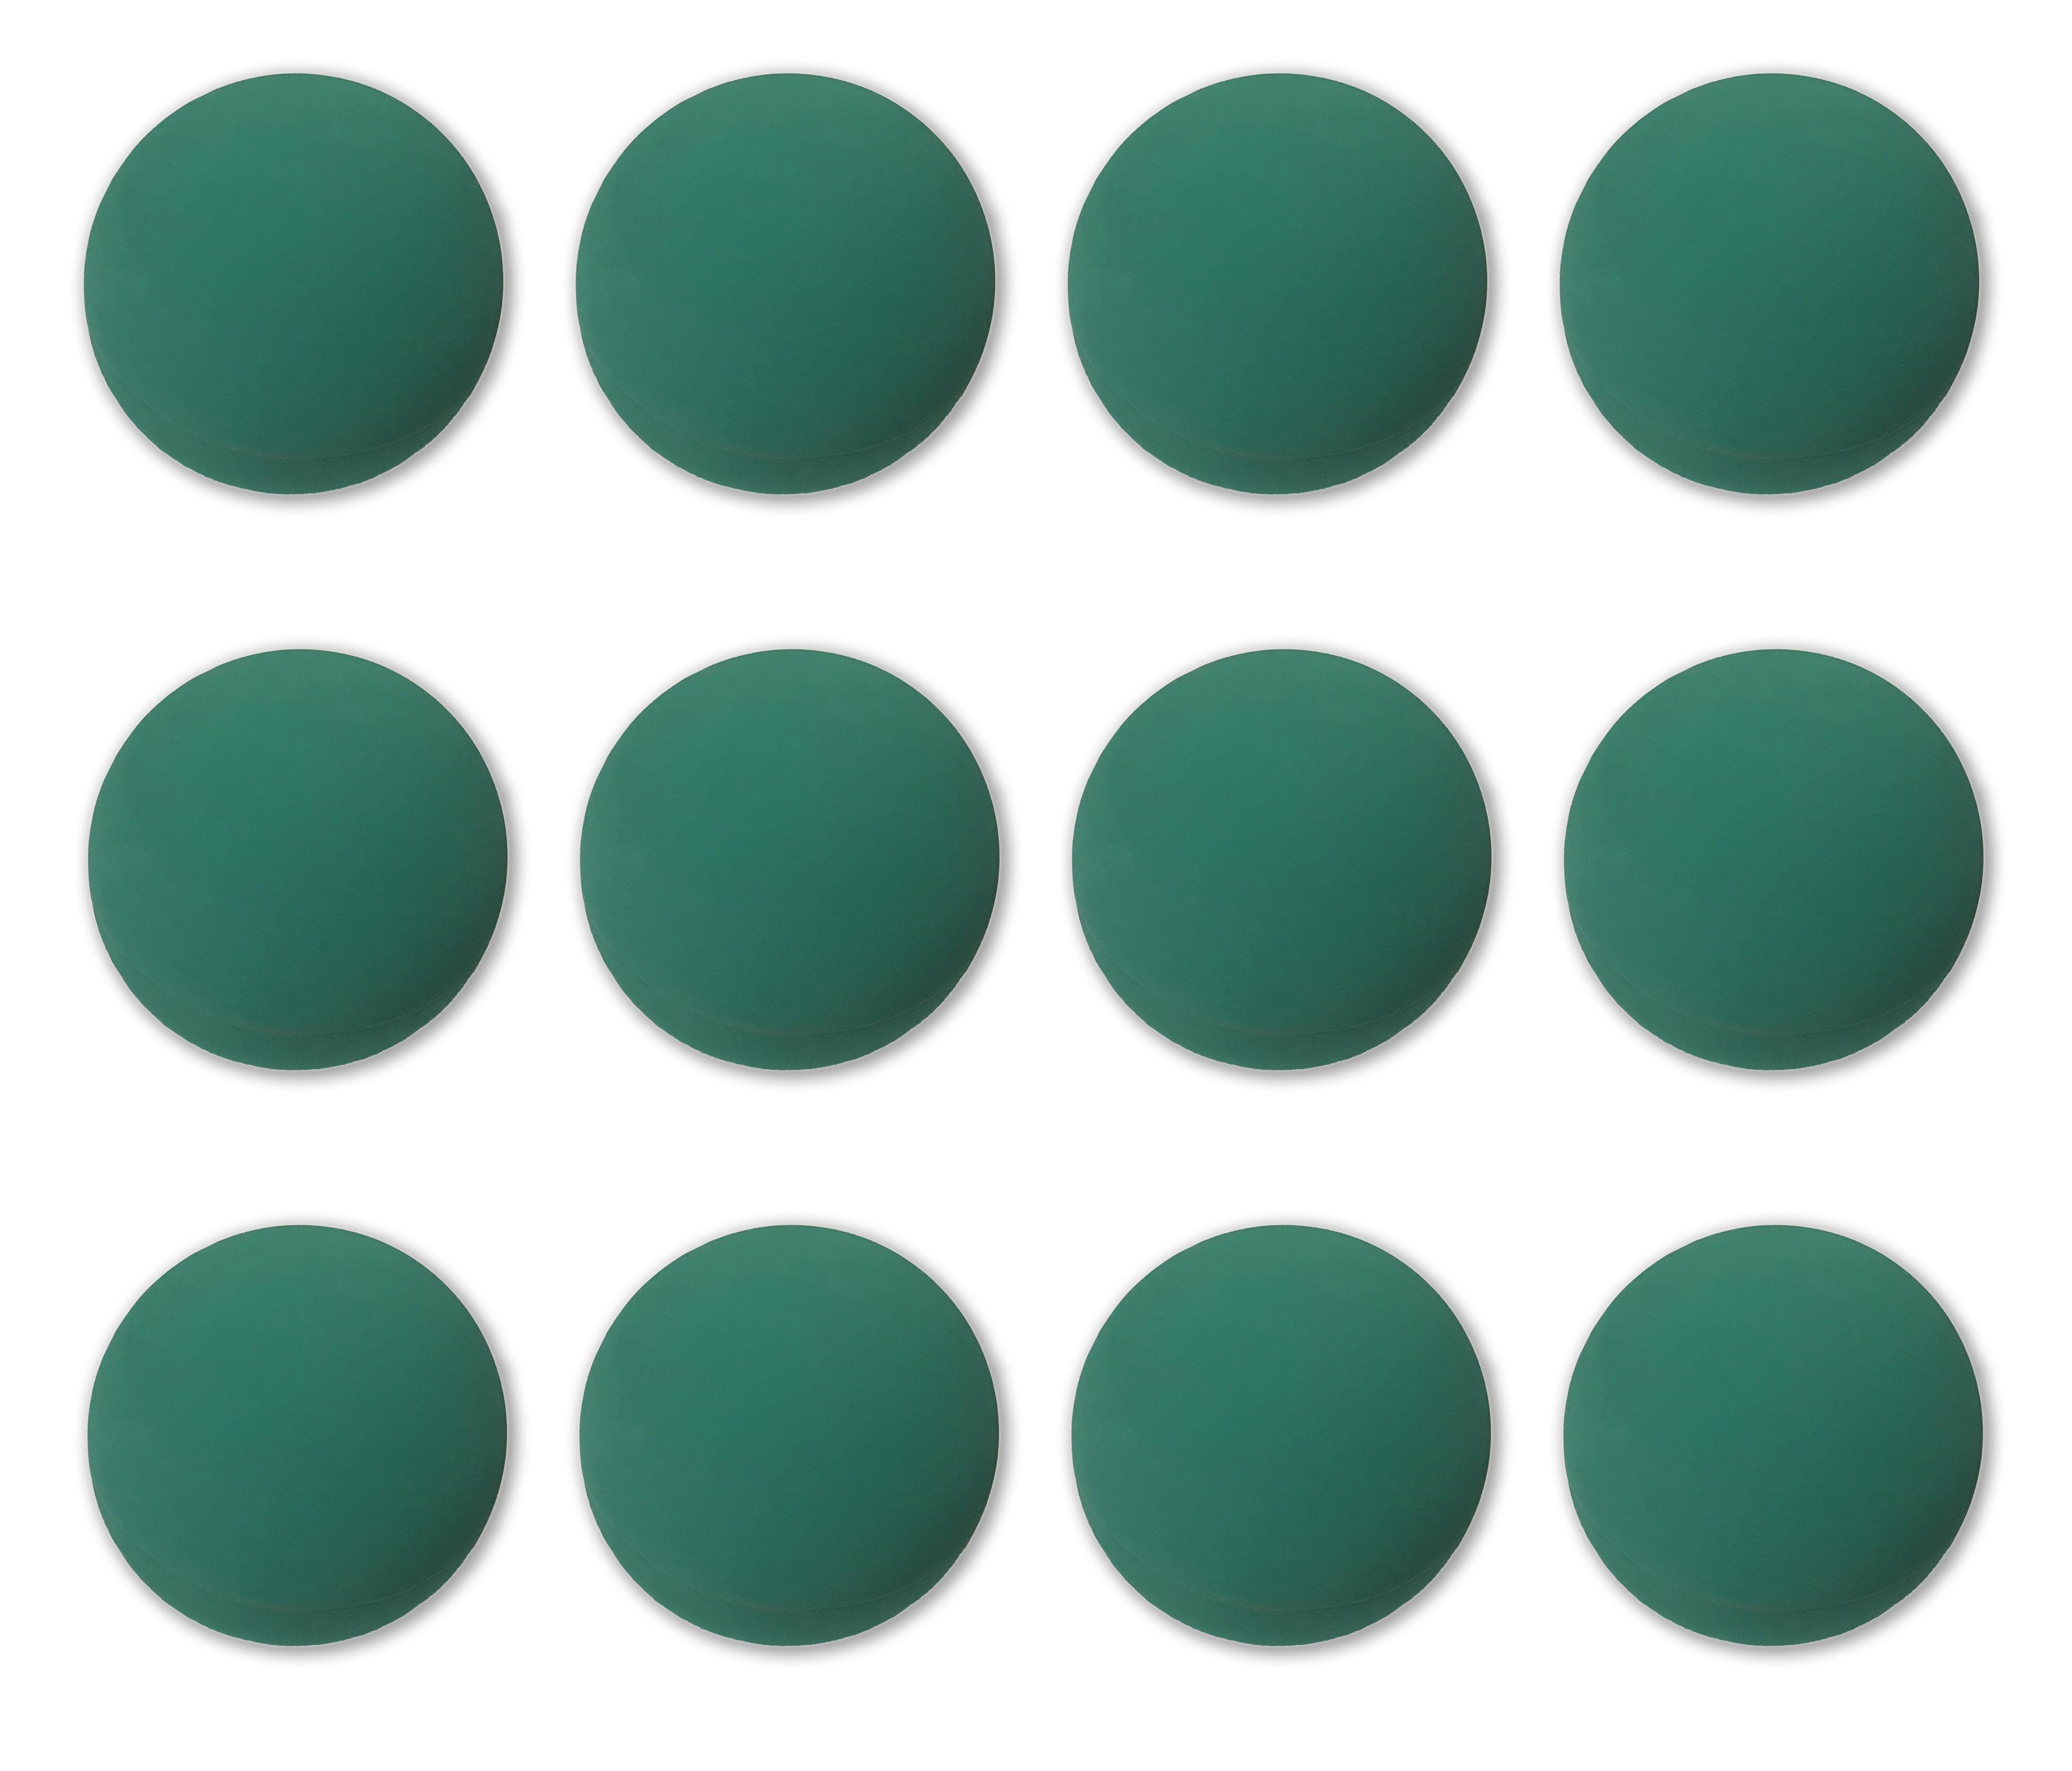 CSI Cannon Sports Racquetballs, Green by CSI